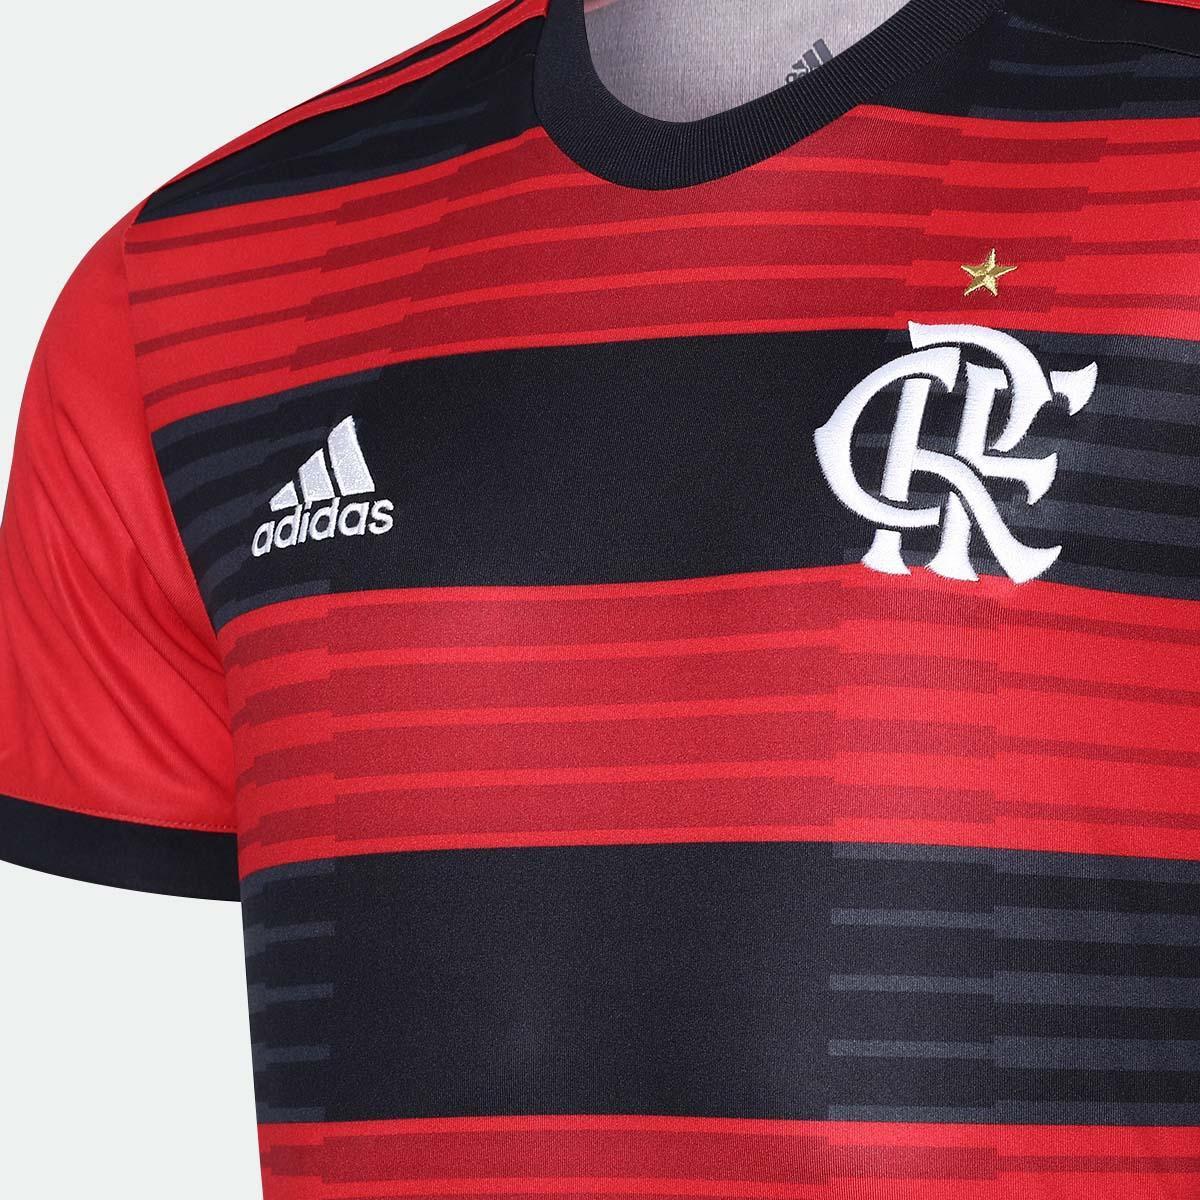 Camisa Flamengo I 2018 s n° Torcedor Adidas Masculina - Vermelho e ... ac399c3db5549